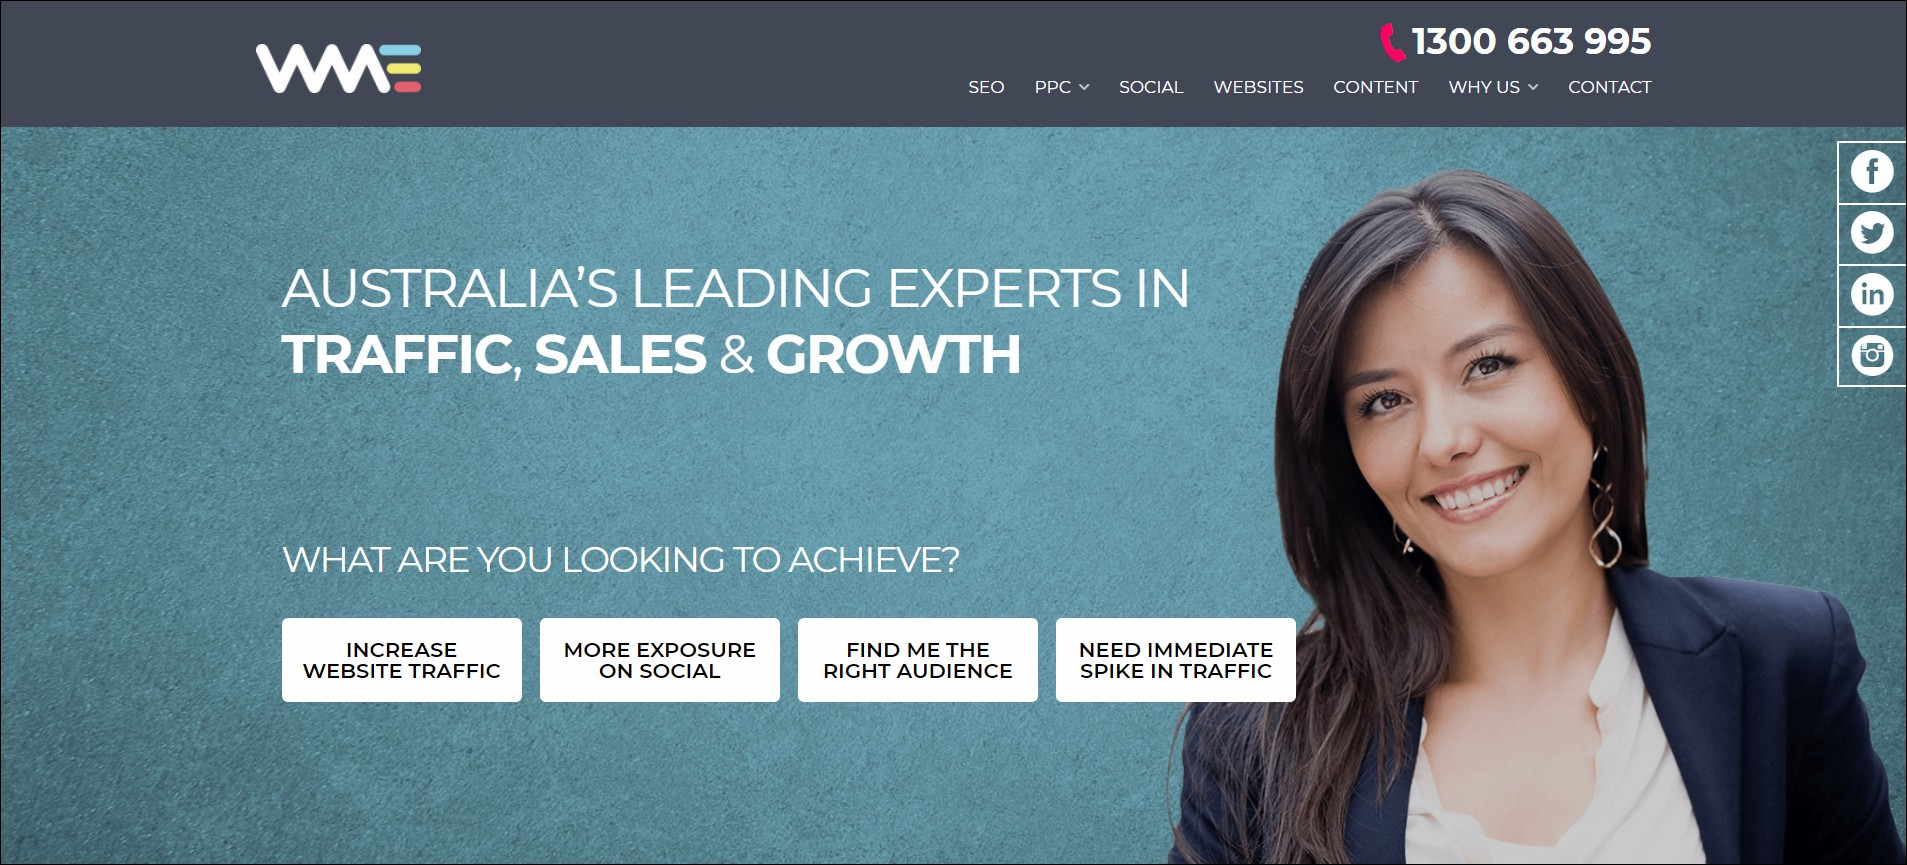 WME: advertising agencies in Australia